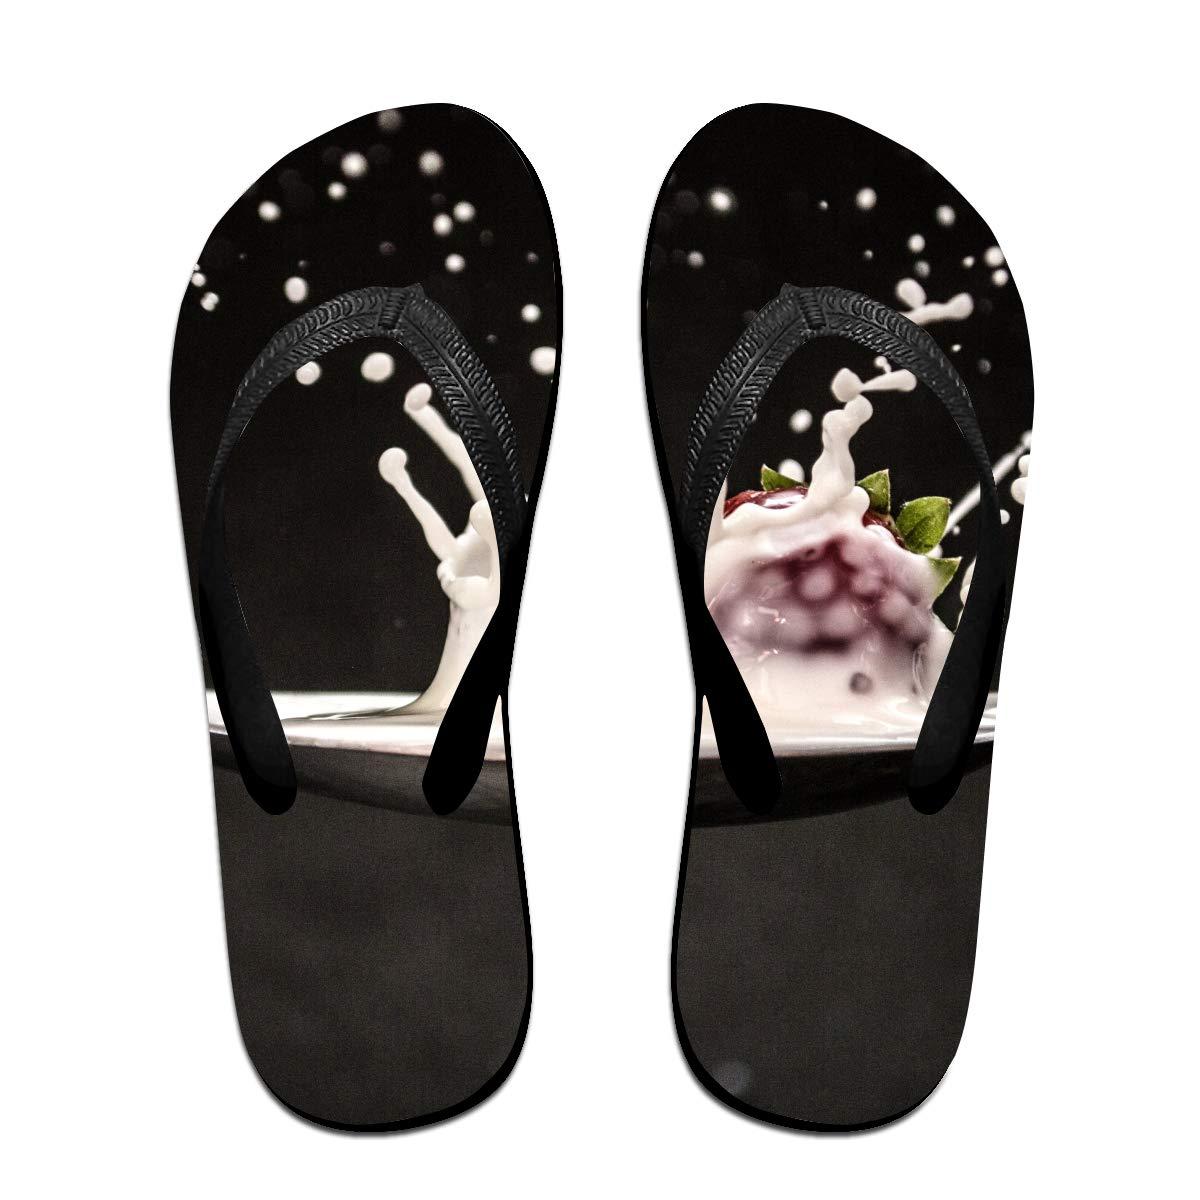 Couple Slipper Strawberry Yogurt Splash Print Flip Flops Unisex Chic Sandals Rubber Non-Slip Spa Thong Slippers